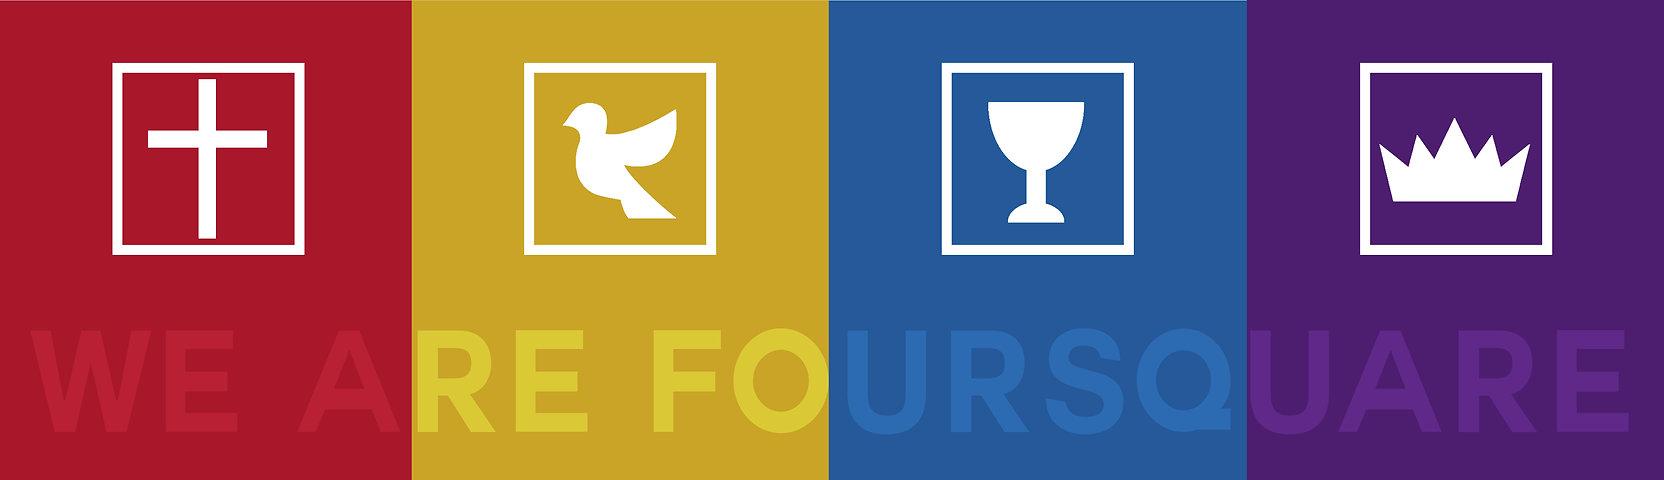 Foursquare Series Web Banner.jpg